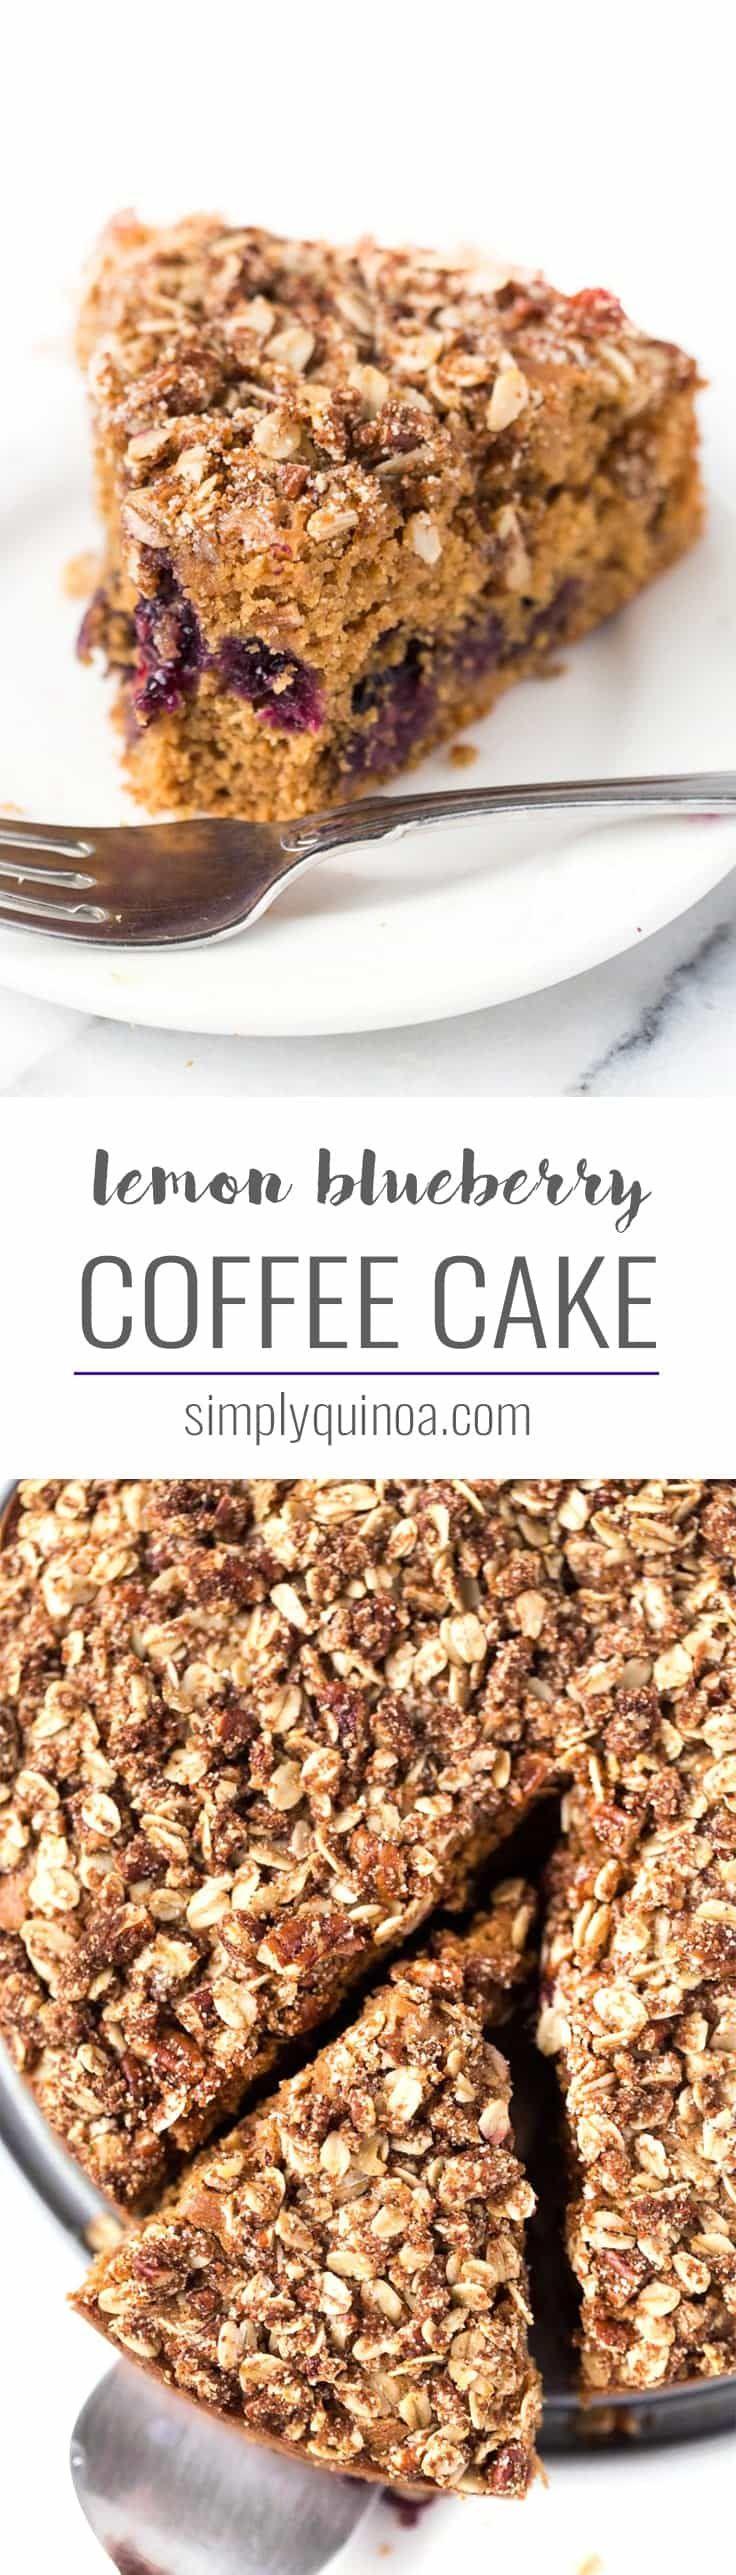 Lemon blueberry coffee cake recipe quinoa dessert